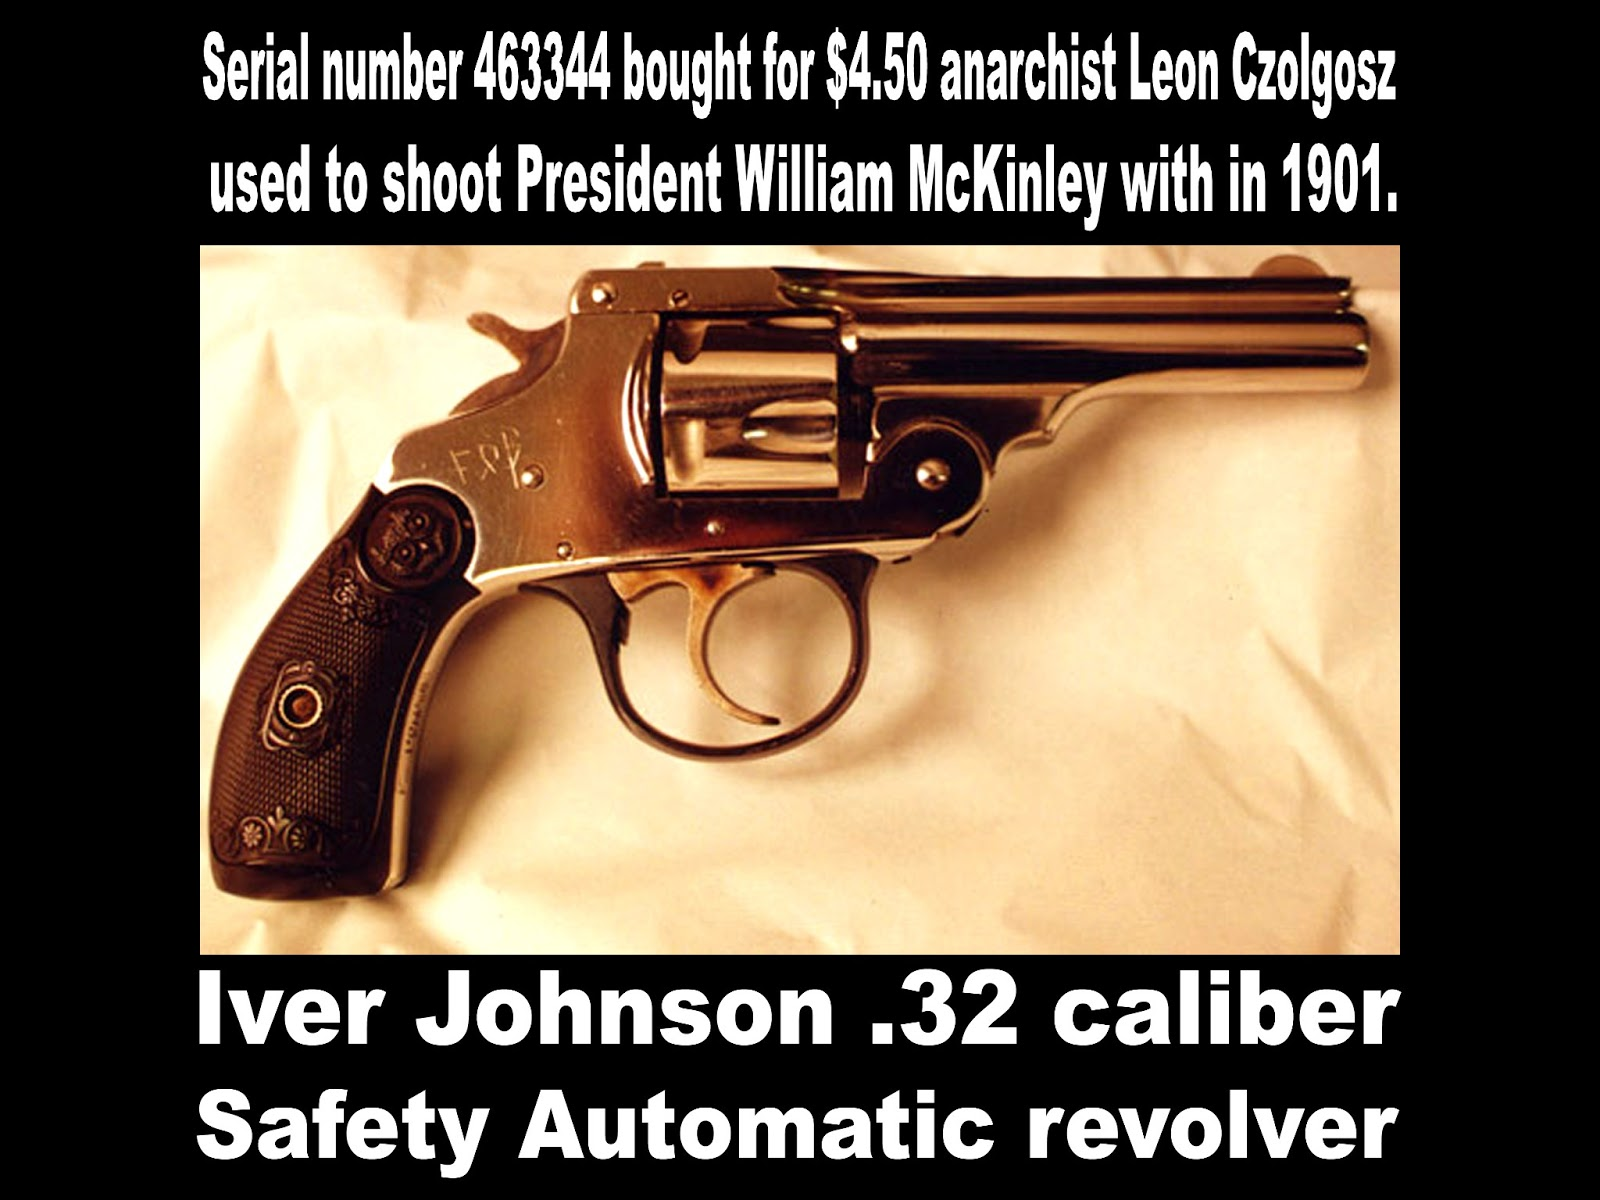 The Assassination of President William McKinley